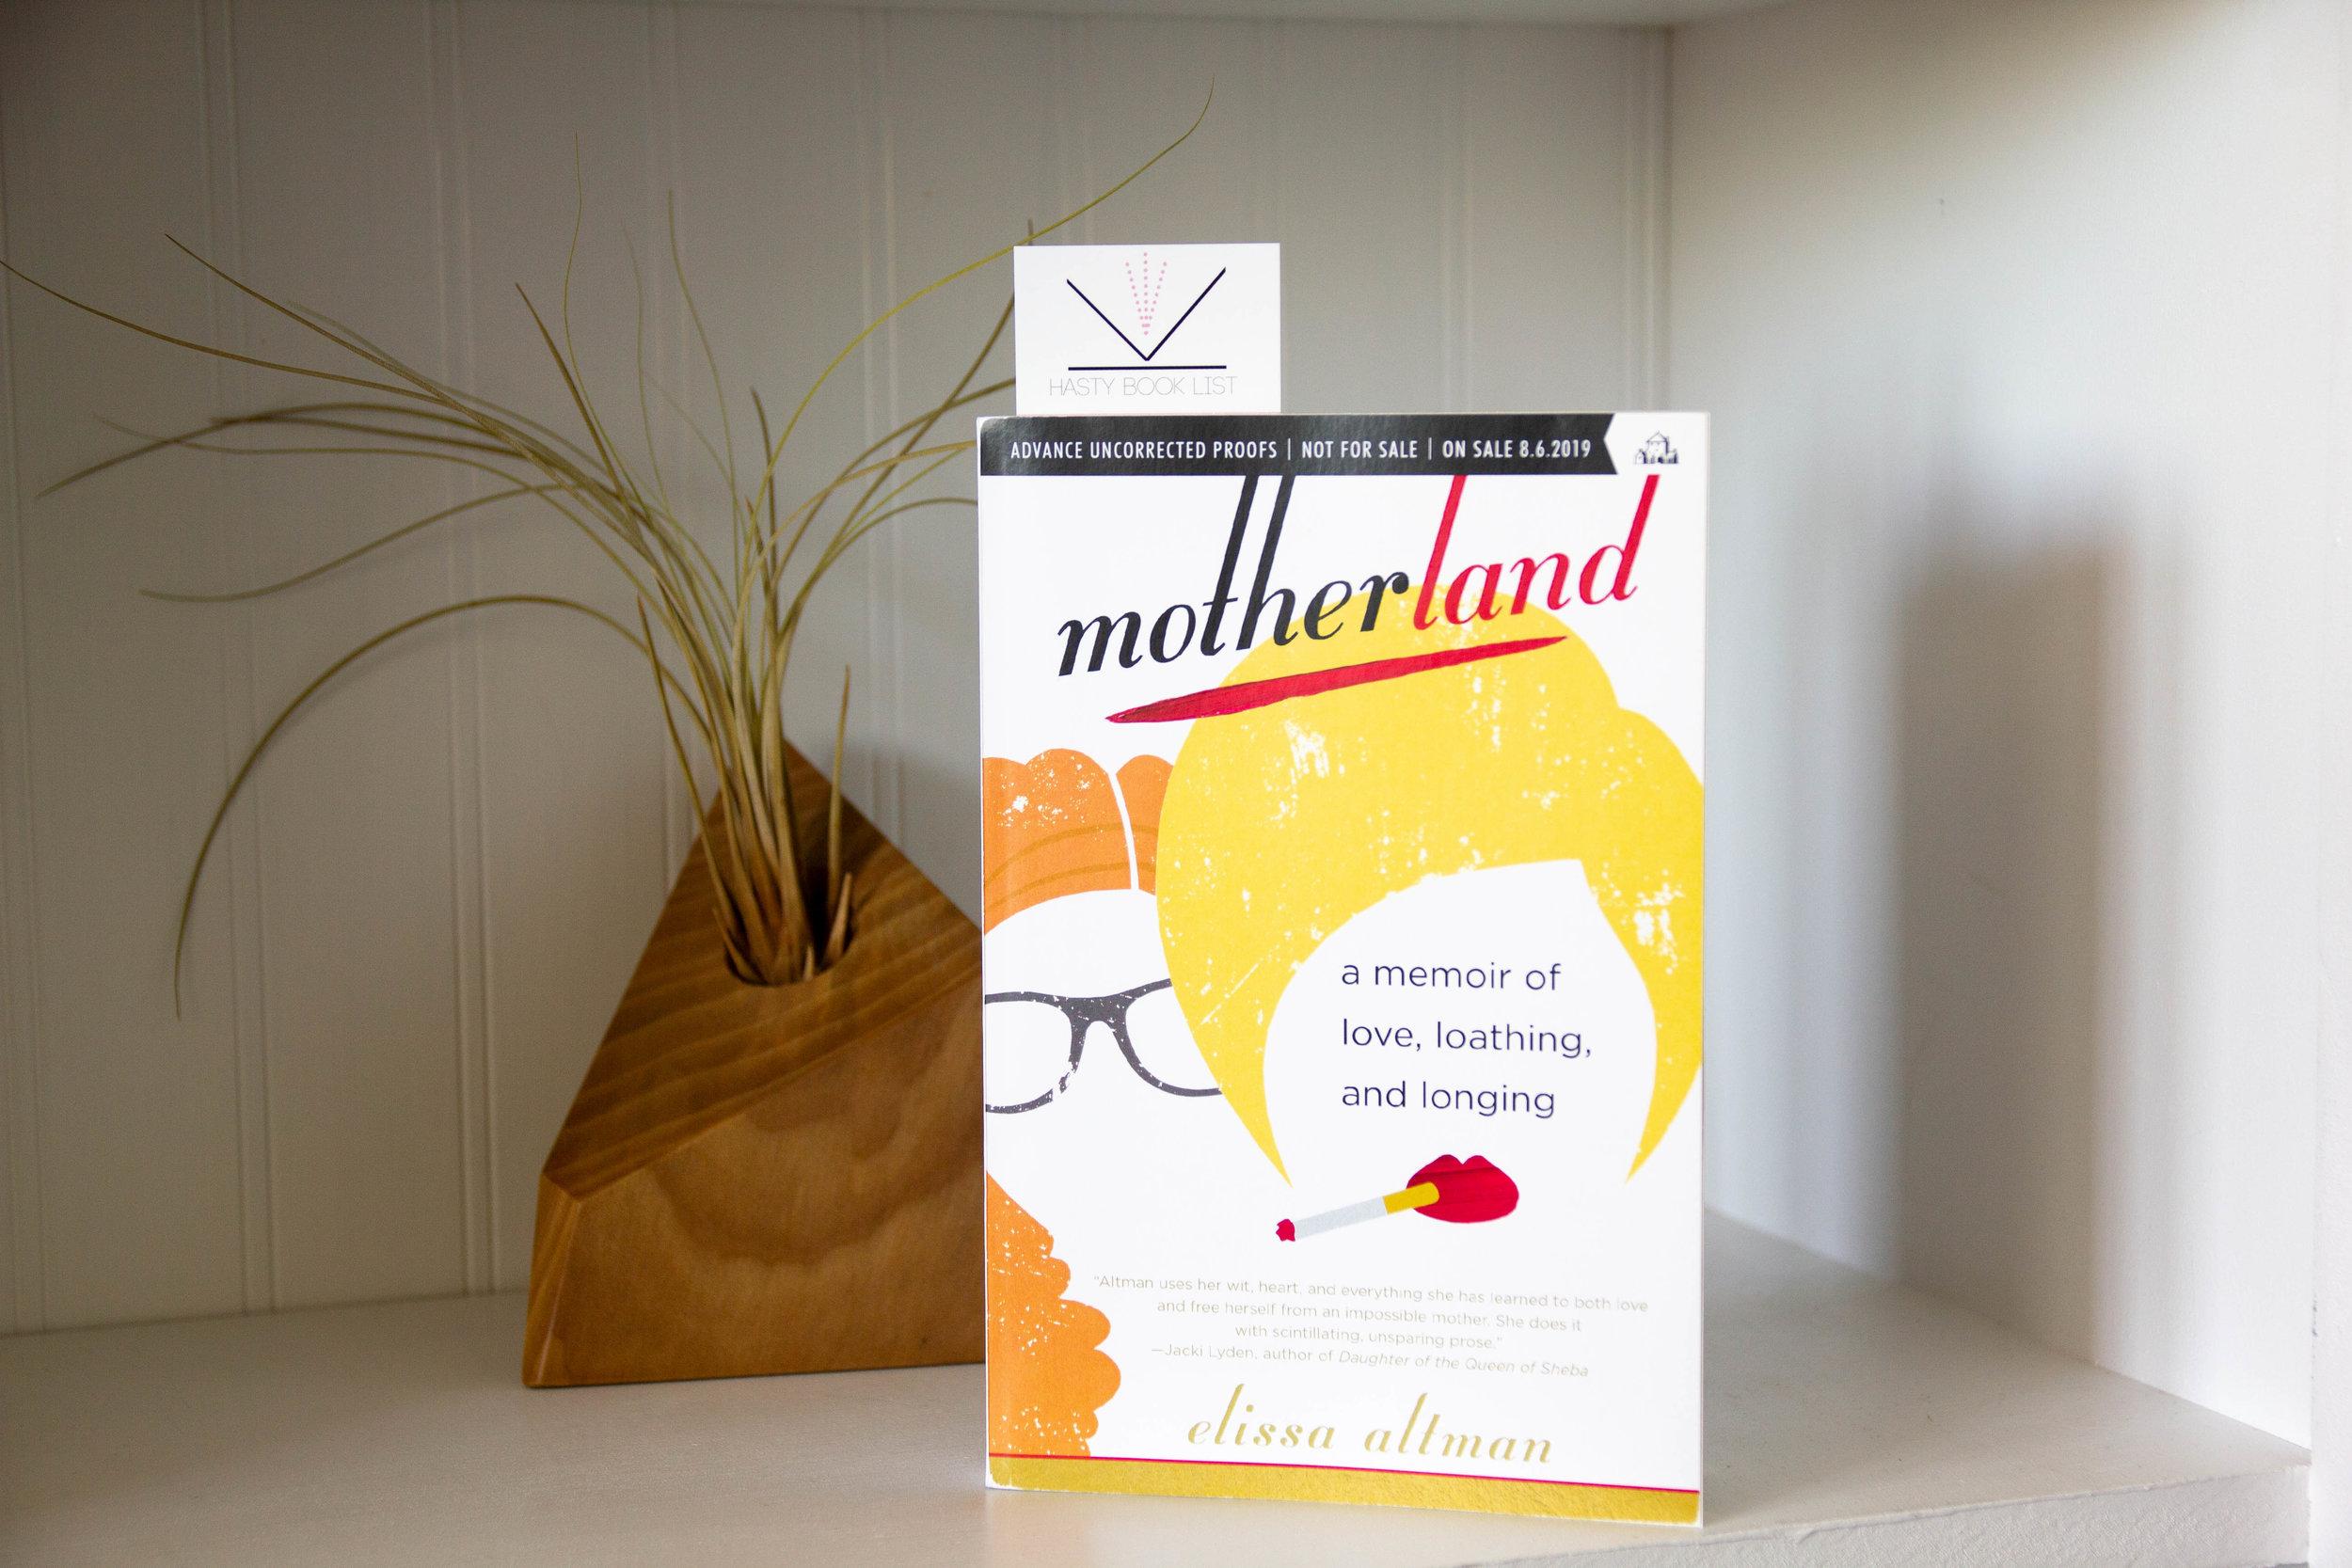 MOTHERLAND- A Memoir of Love, Loathing, and Longing-1.jpg